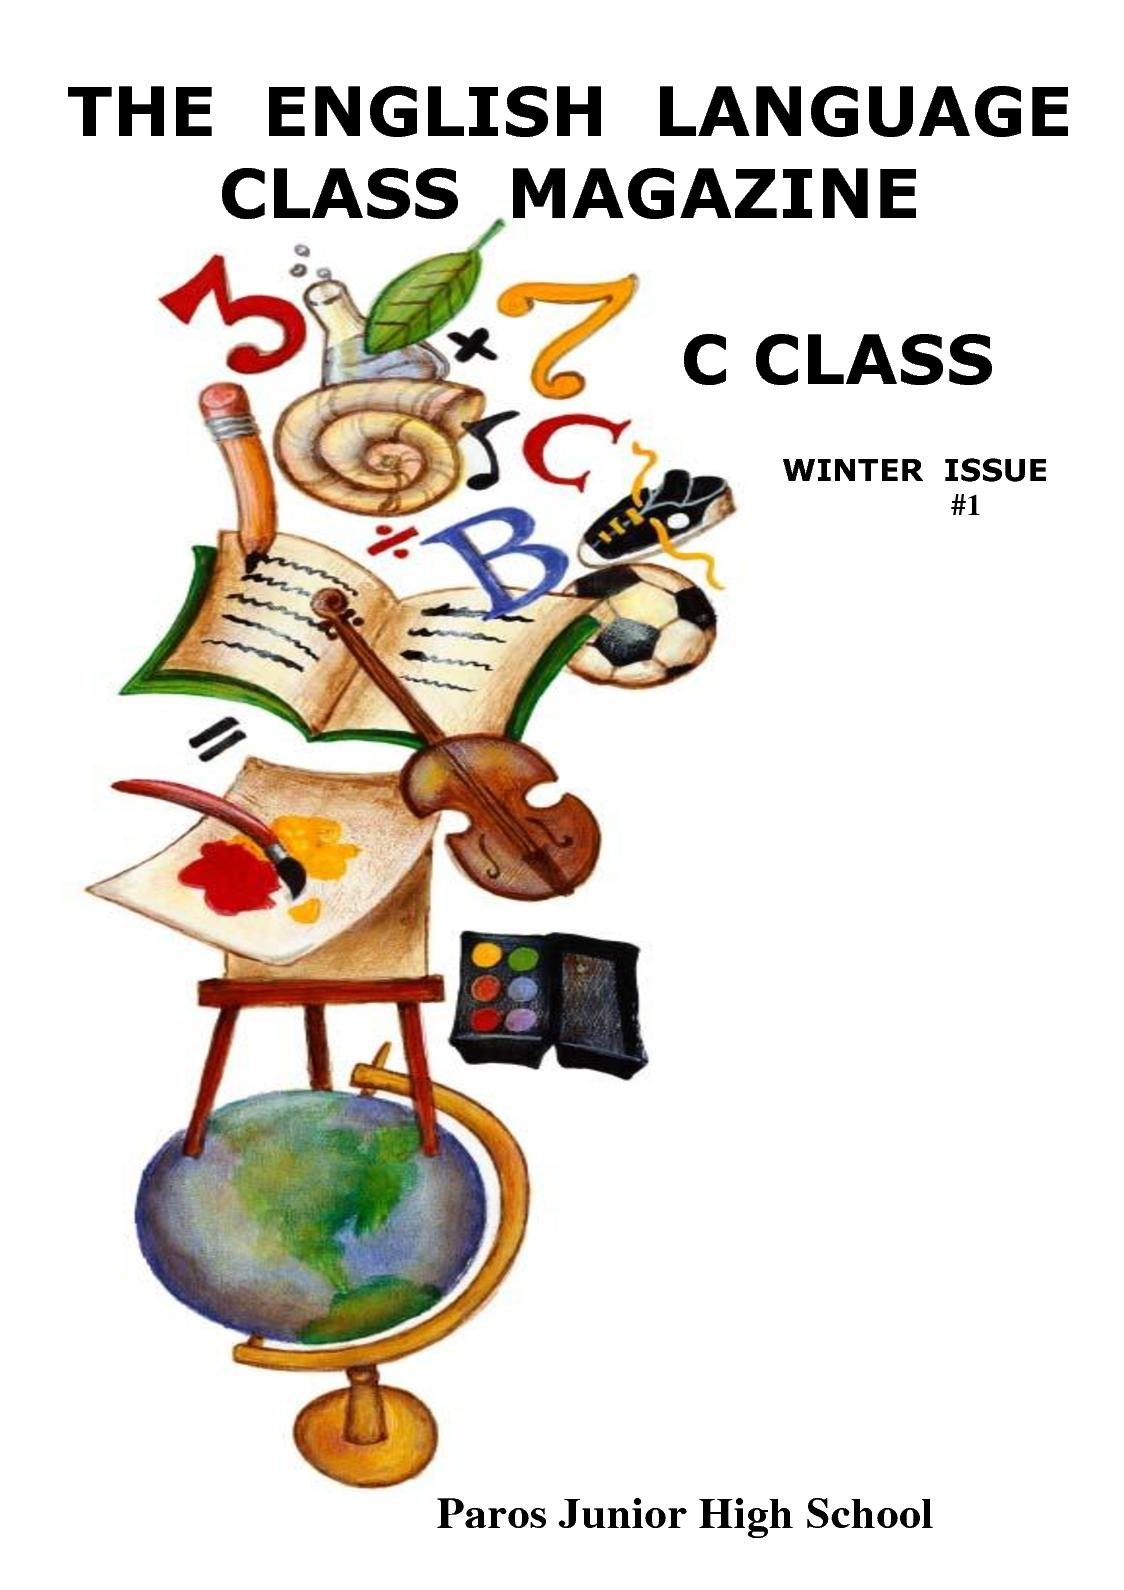 calaméo - the english language class magazine # 1